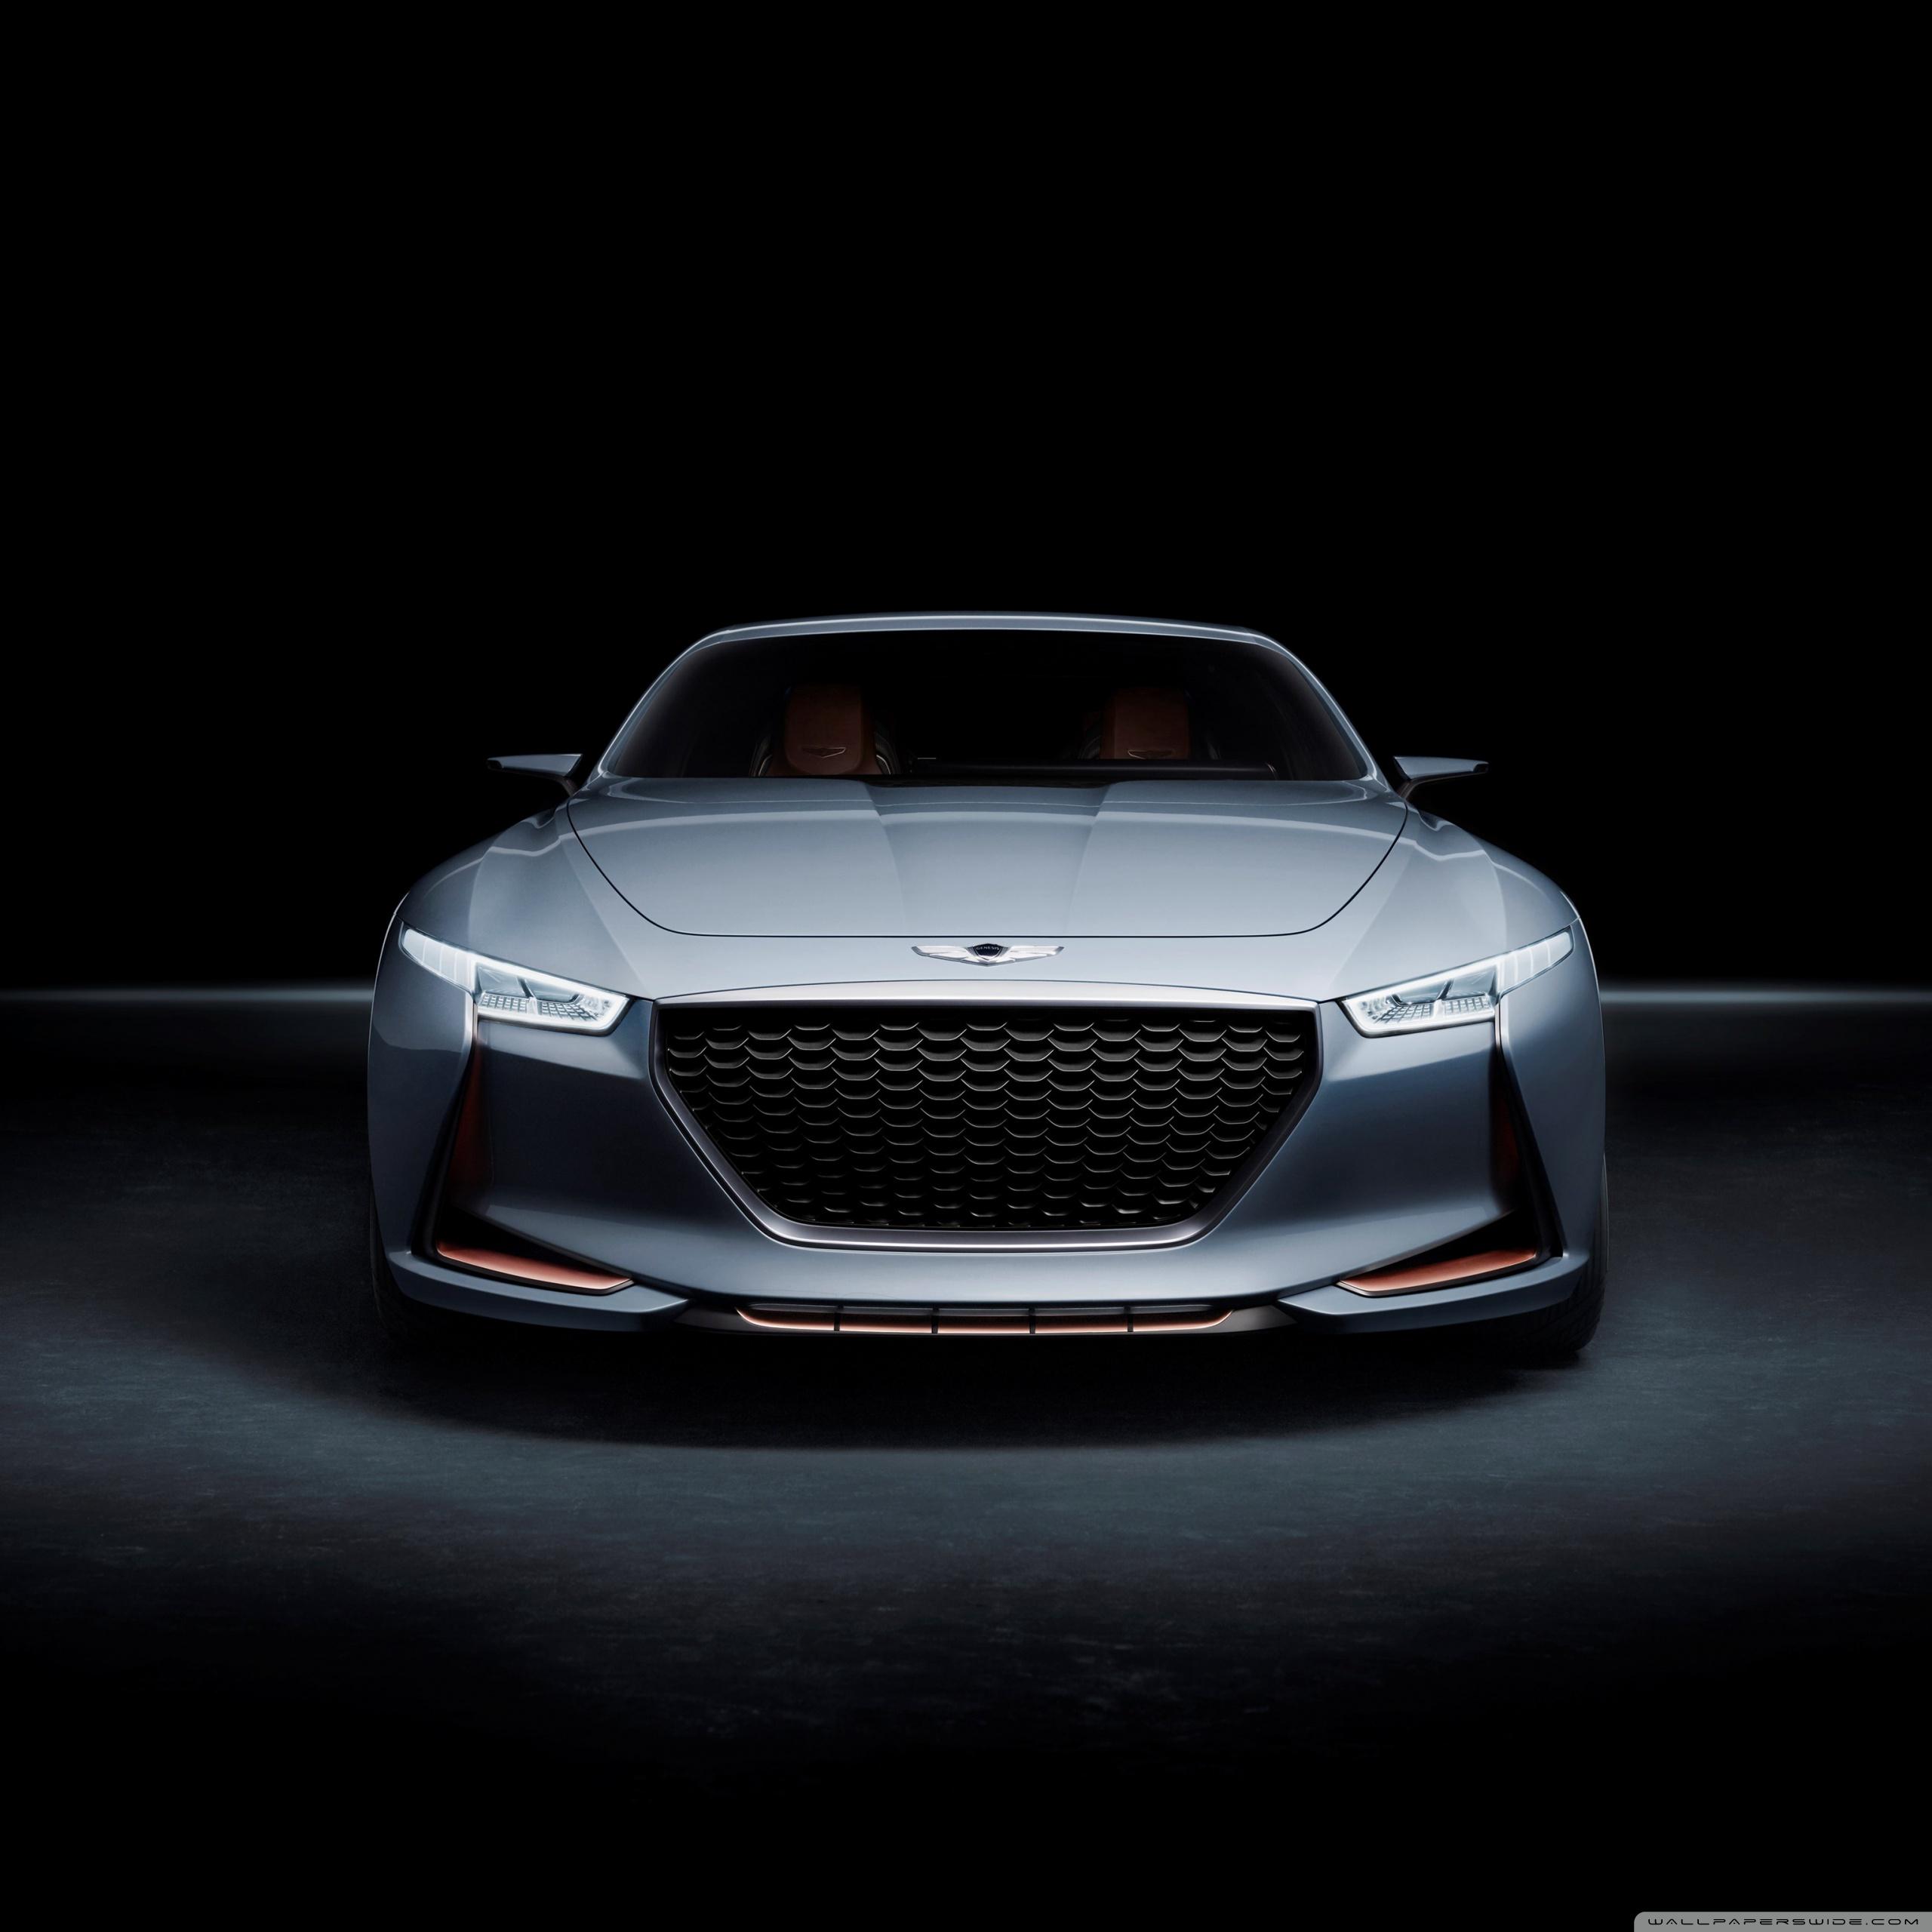 Hyundai Genesis Car World Best 3d Wallpaper